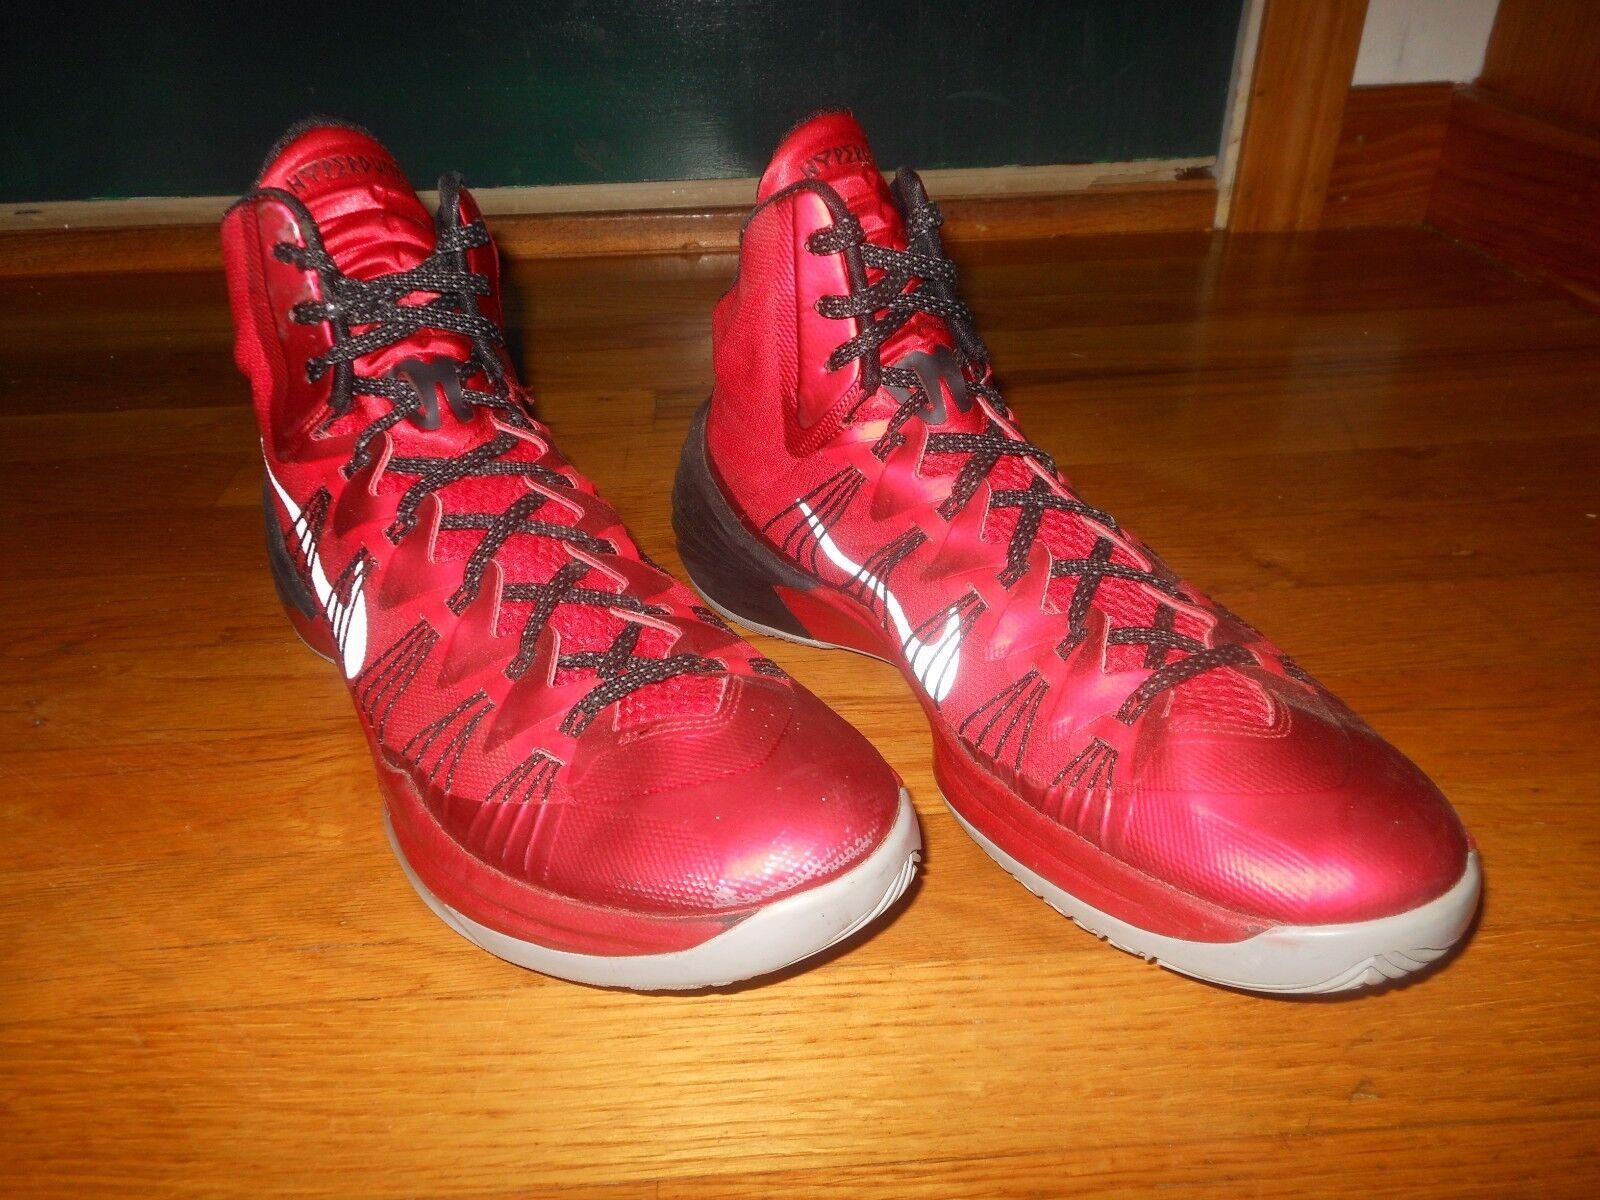 Nike basket hyperdunk scarpe da basket Nike - uomini sz 12 m - 599537-602 - eccellente cond 299802